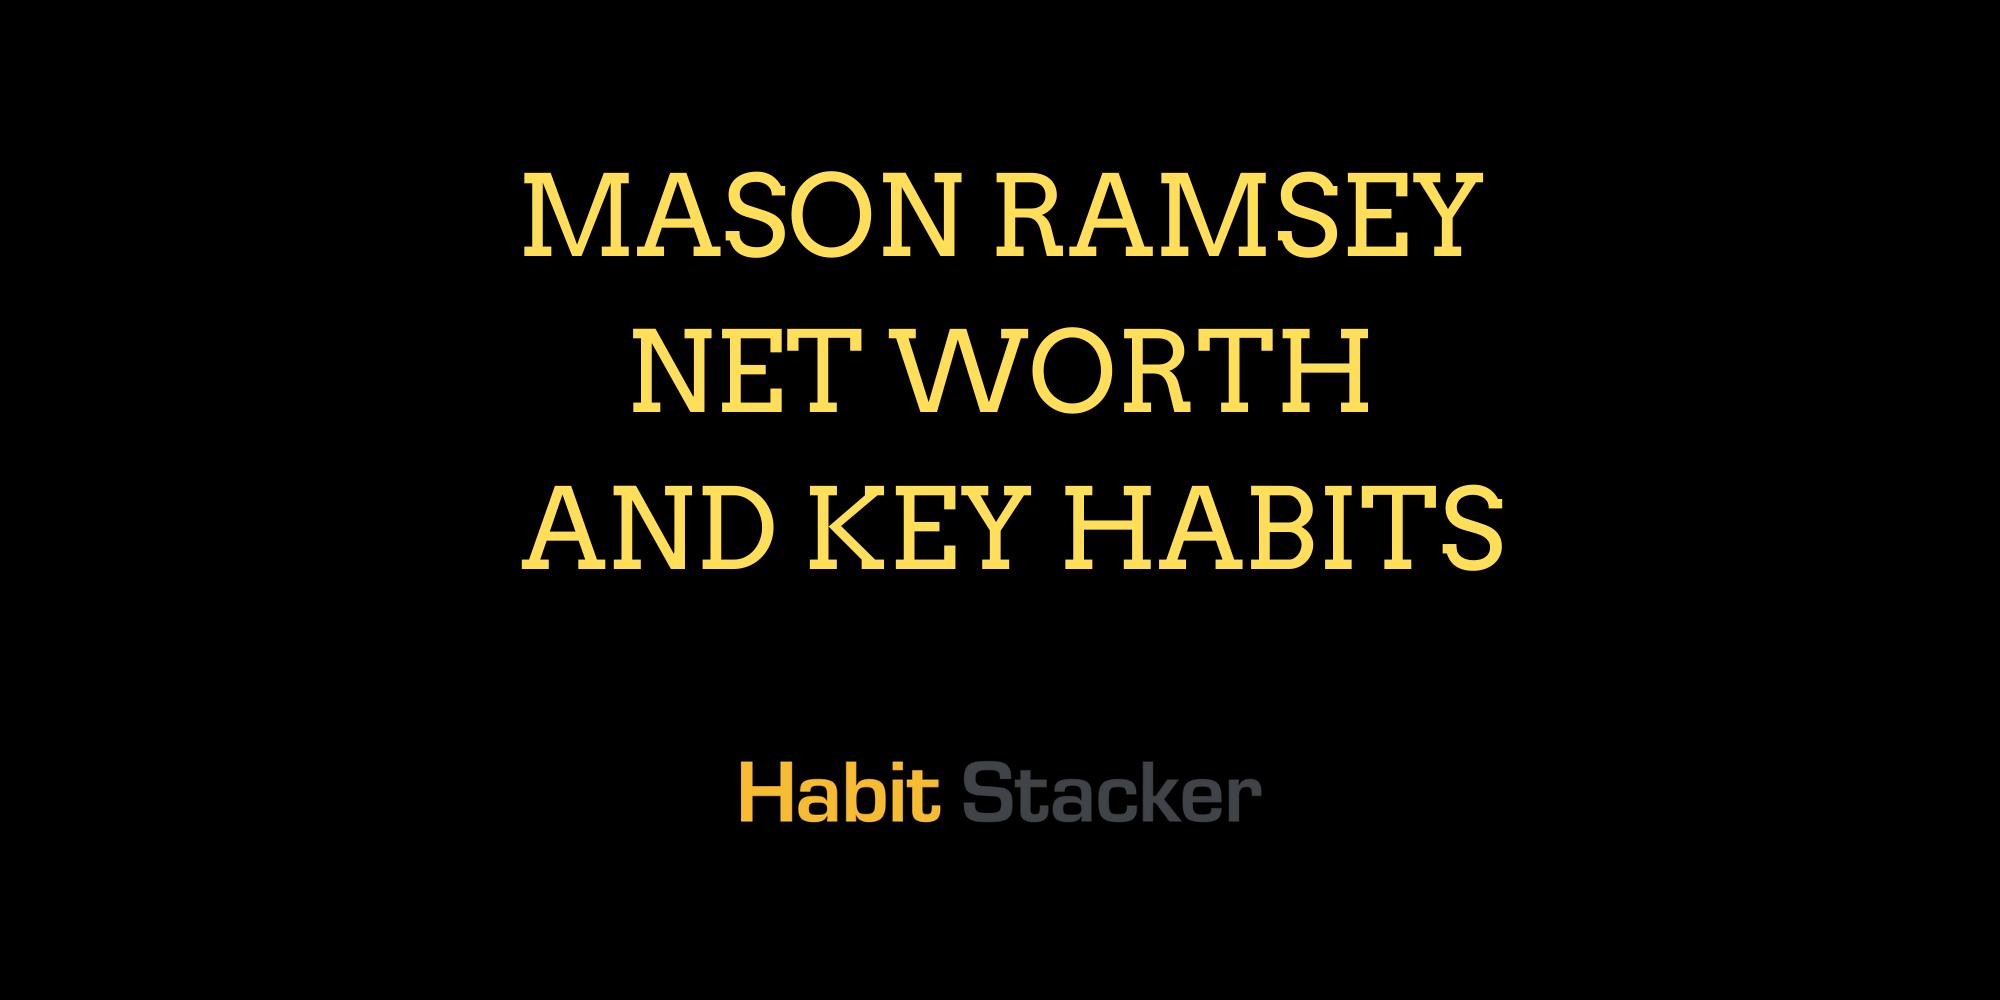 Mason Ramsey Net Worth and Key Habits